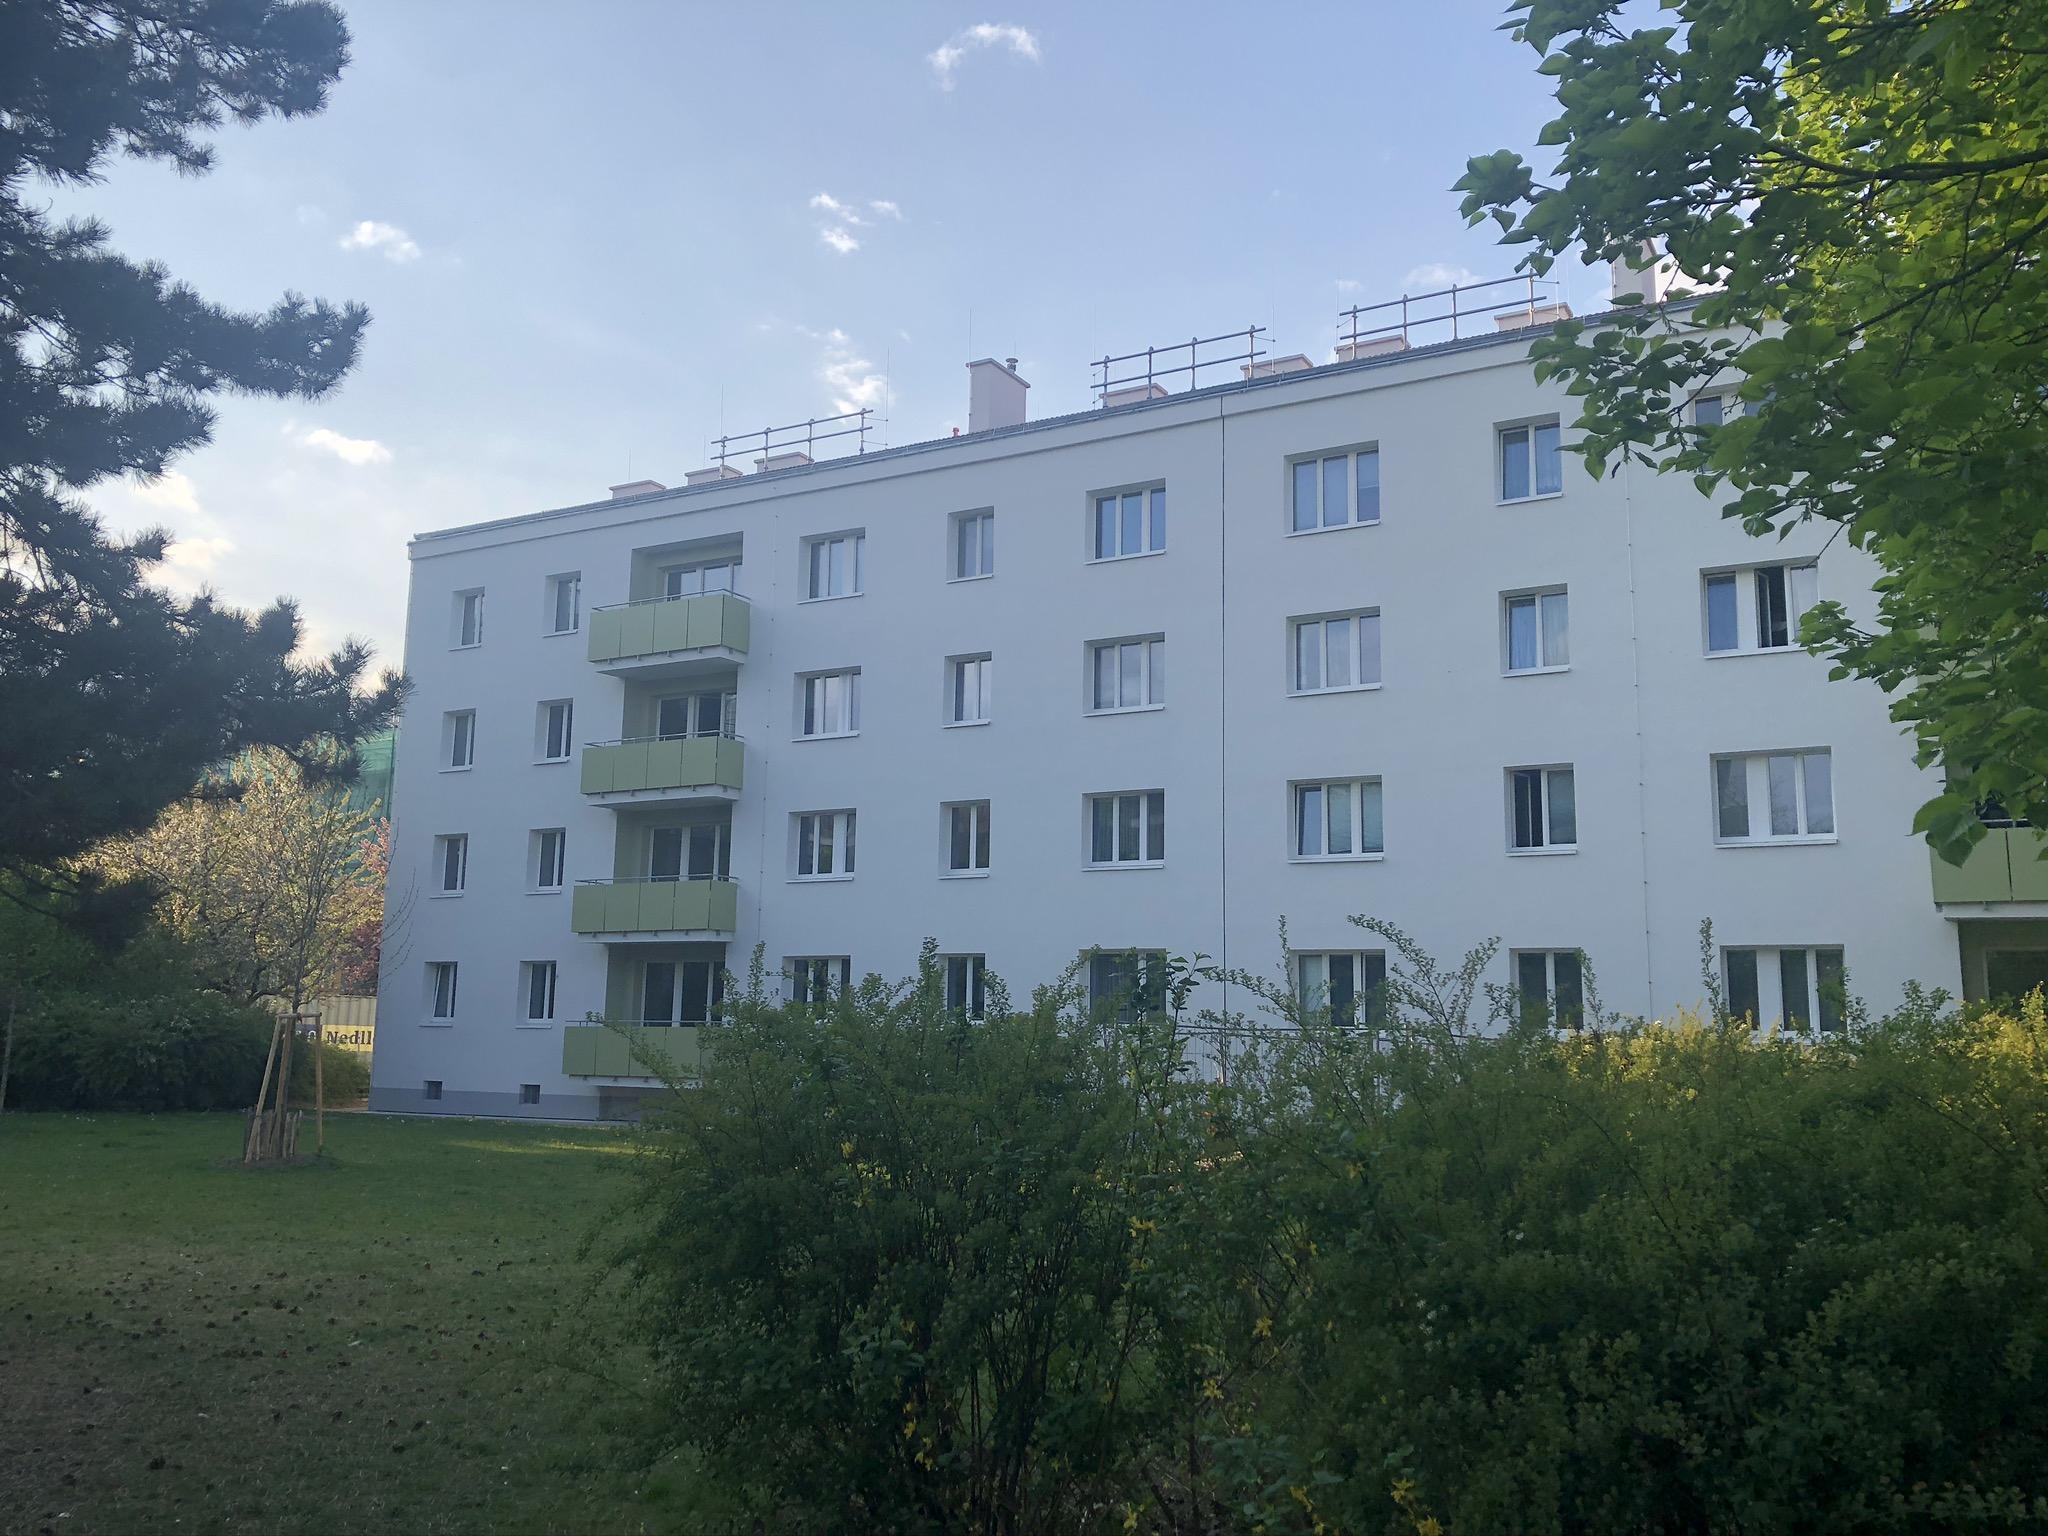 Markhof-Gasse-15